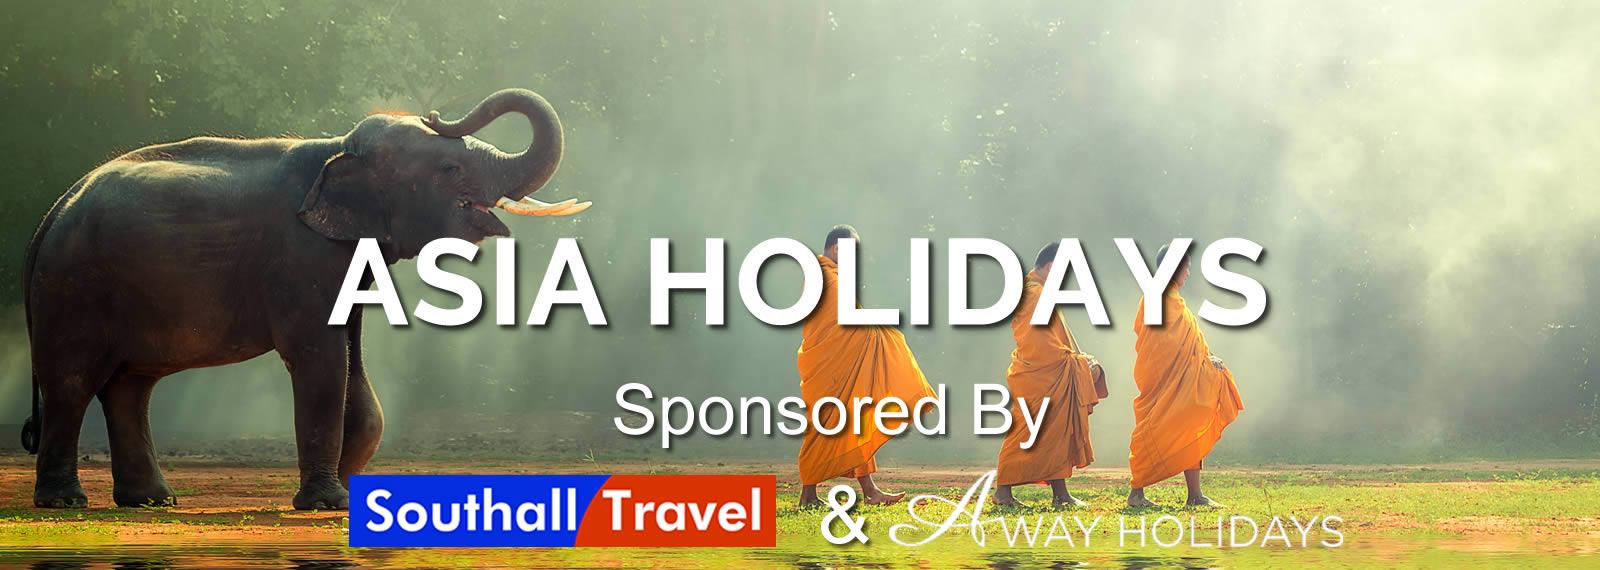 Asia Holidays